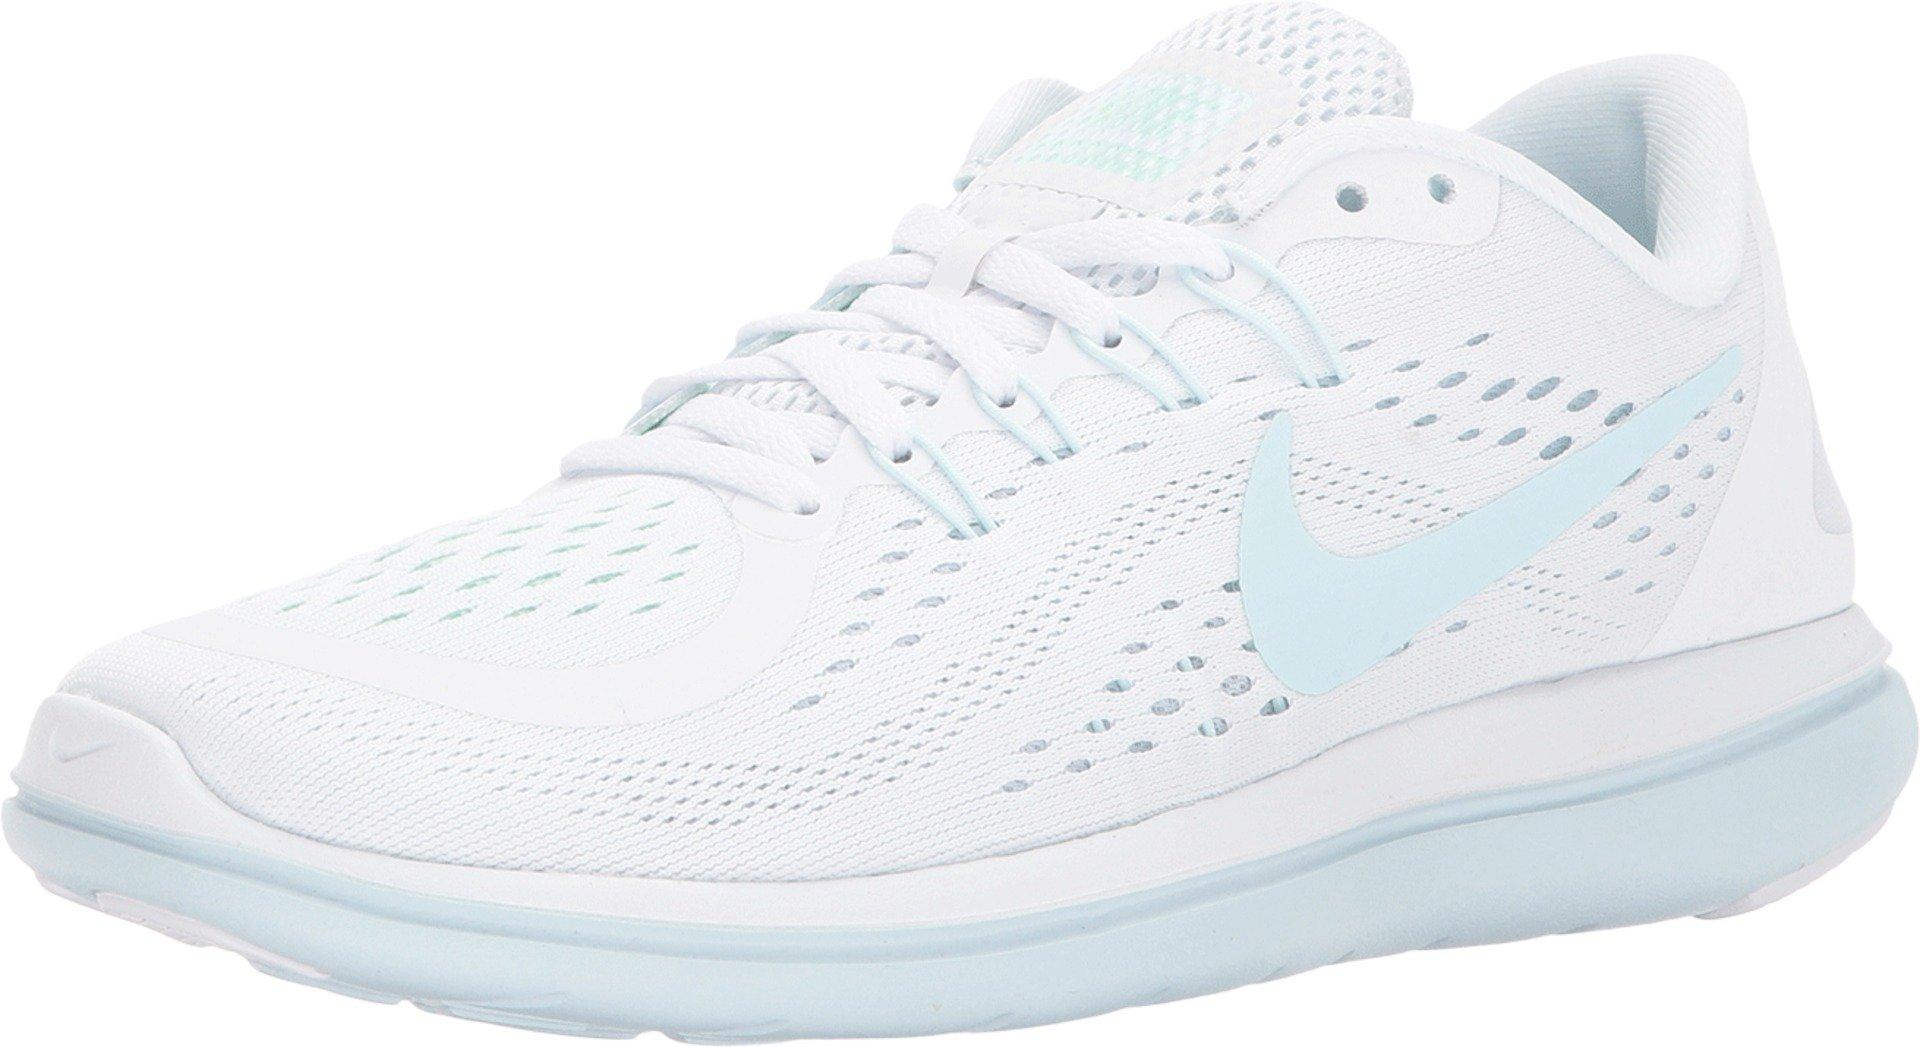 sale retailer 2885d 98141 Nike Women's Free RN 2017 Running Shoe (11 M US, White/Glacier Blue-Blue  Tint)